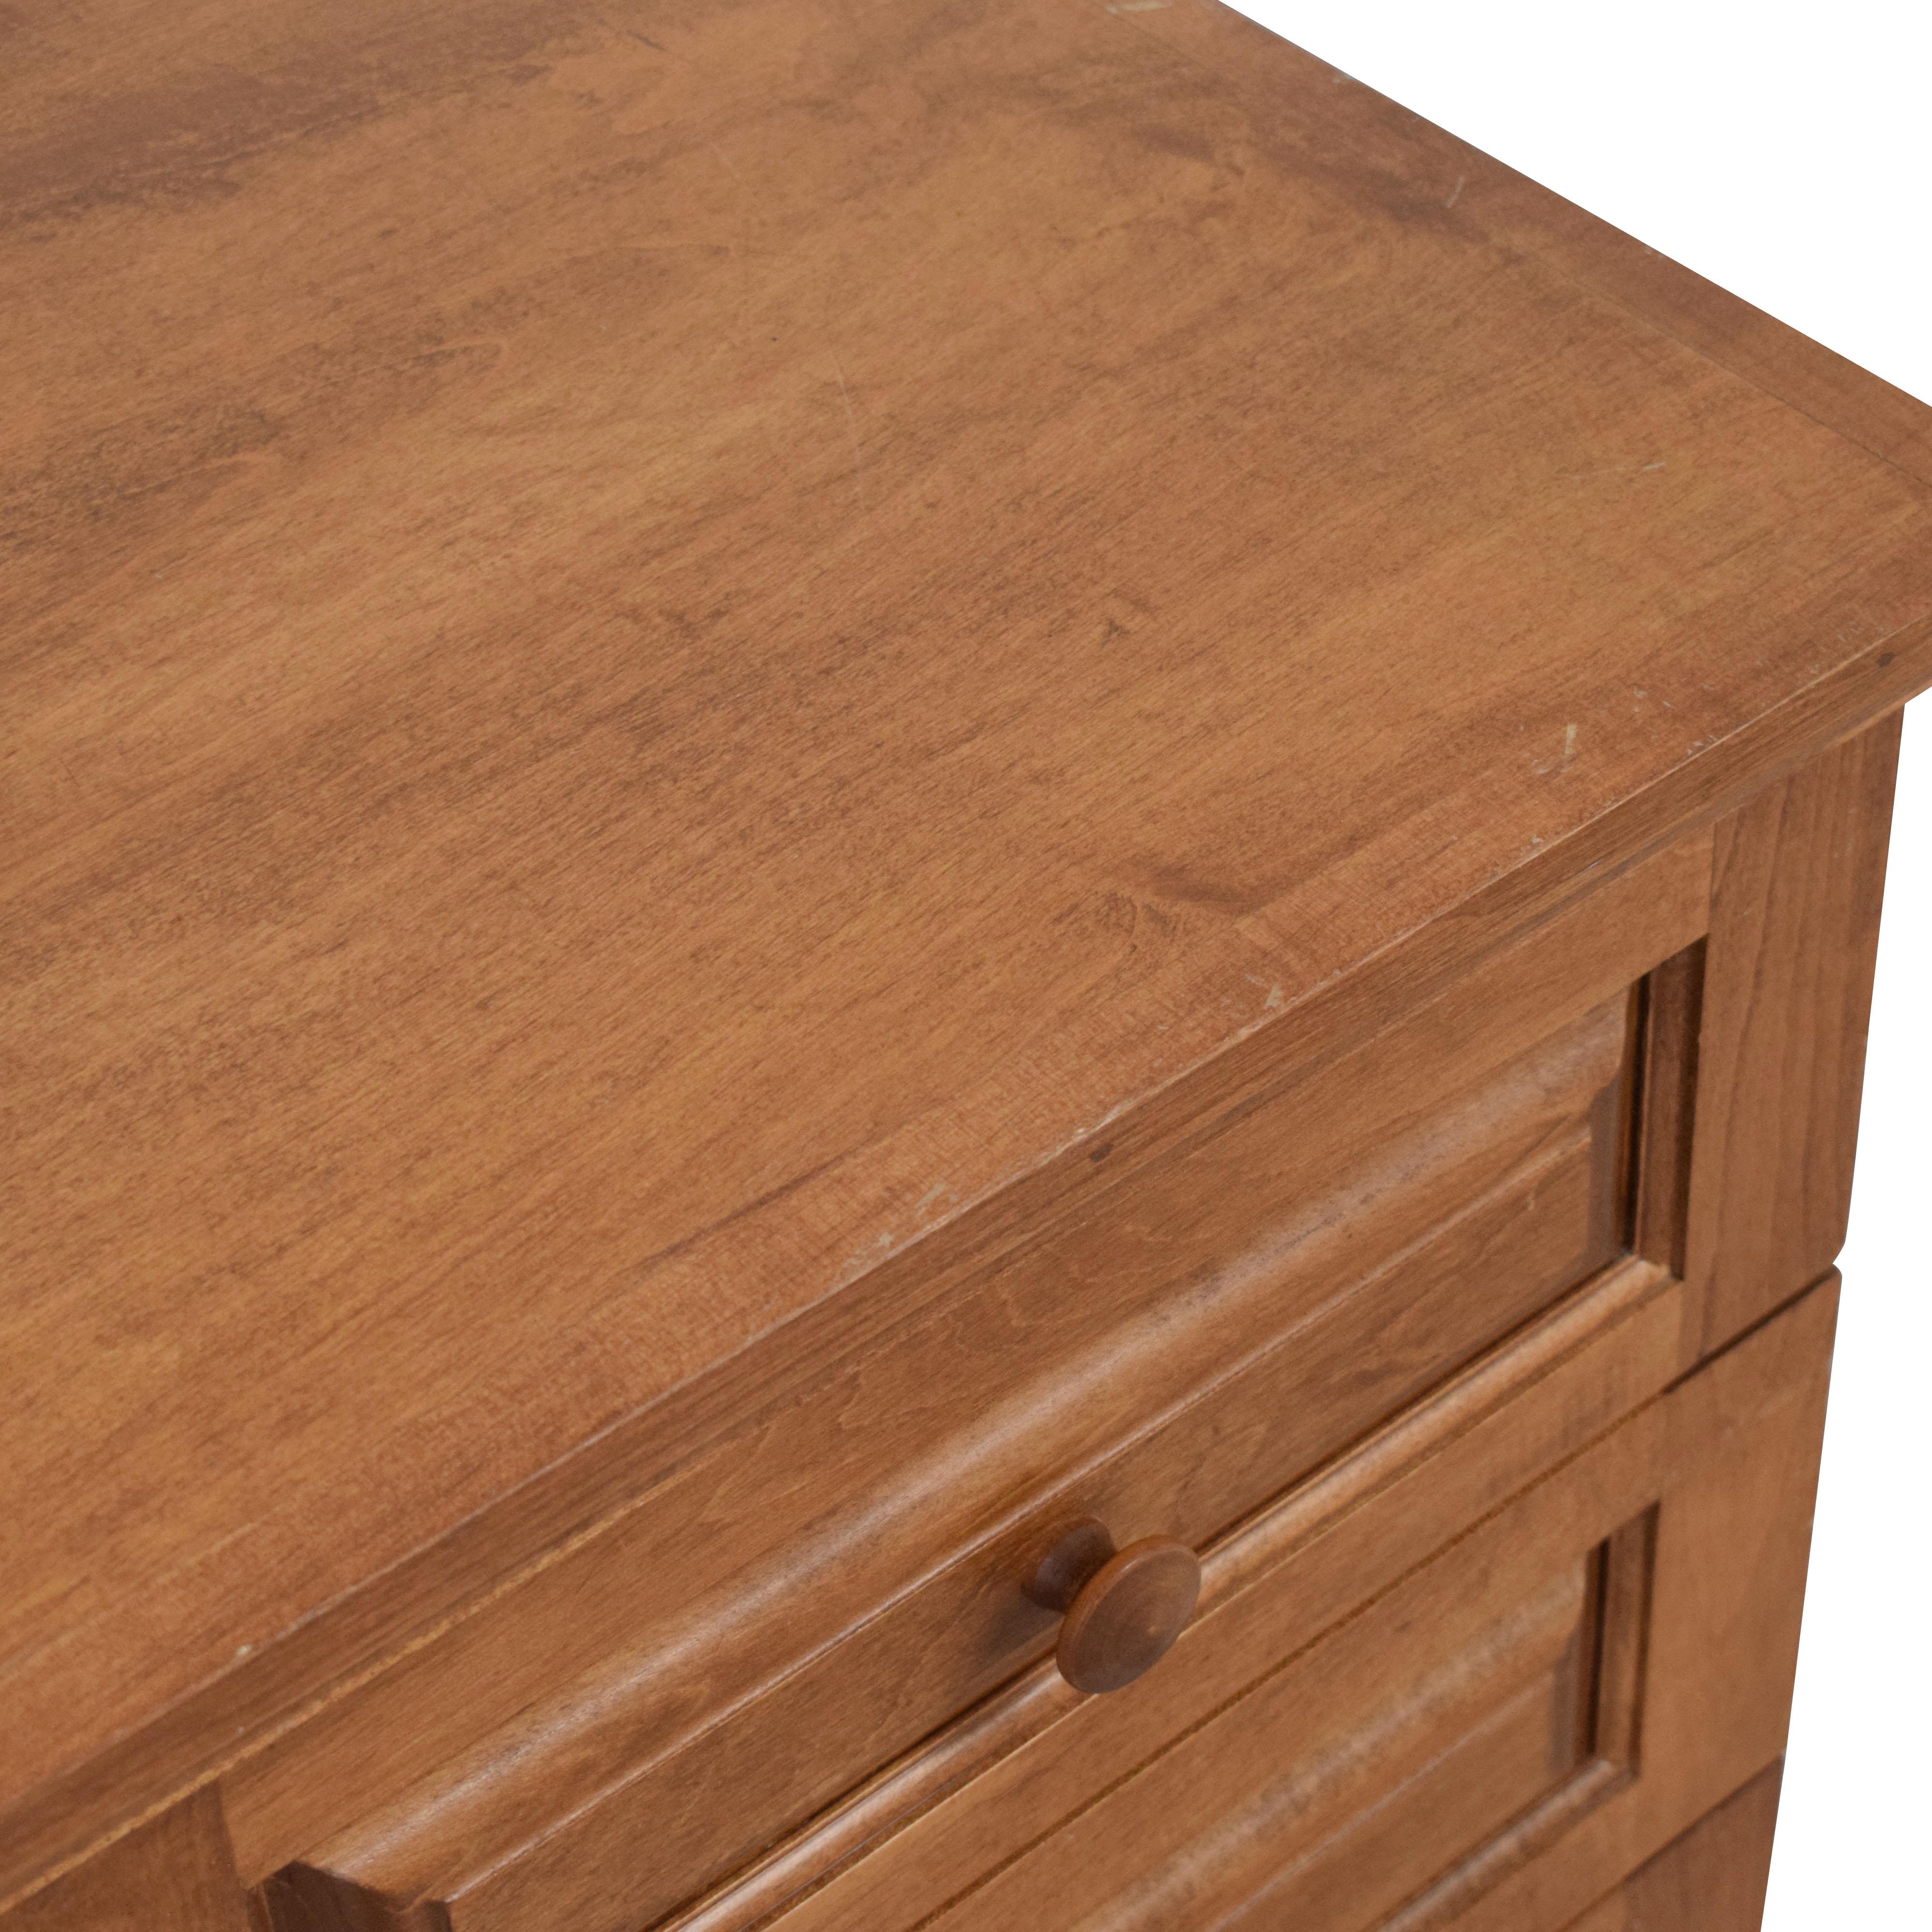 Gothic Cabinet Craft Gothic Cabinet Craft Executive Desk ma